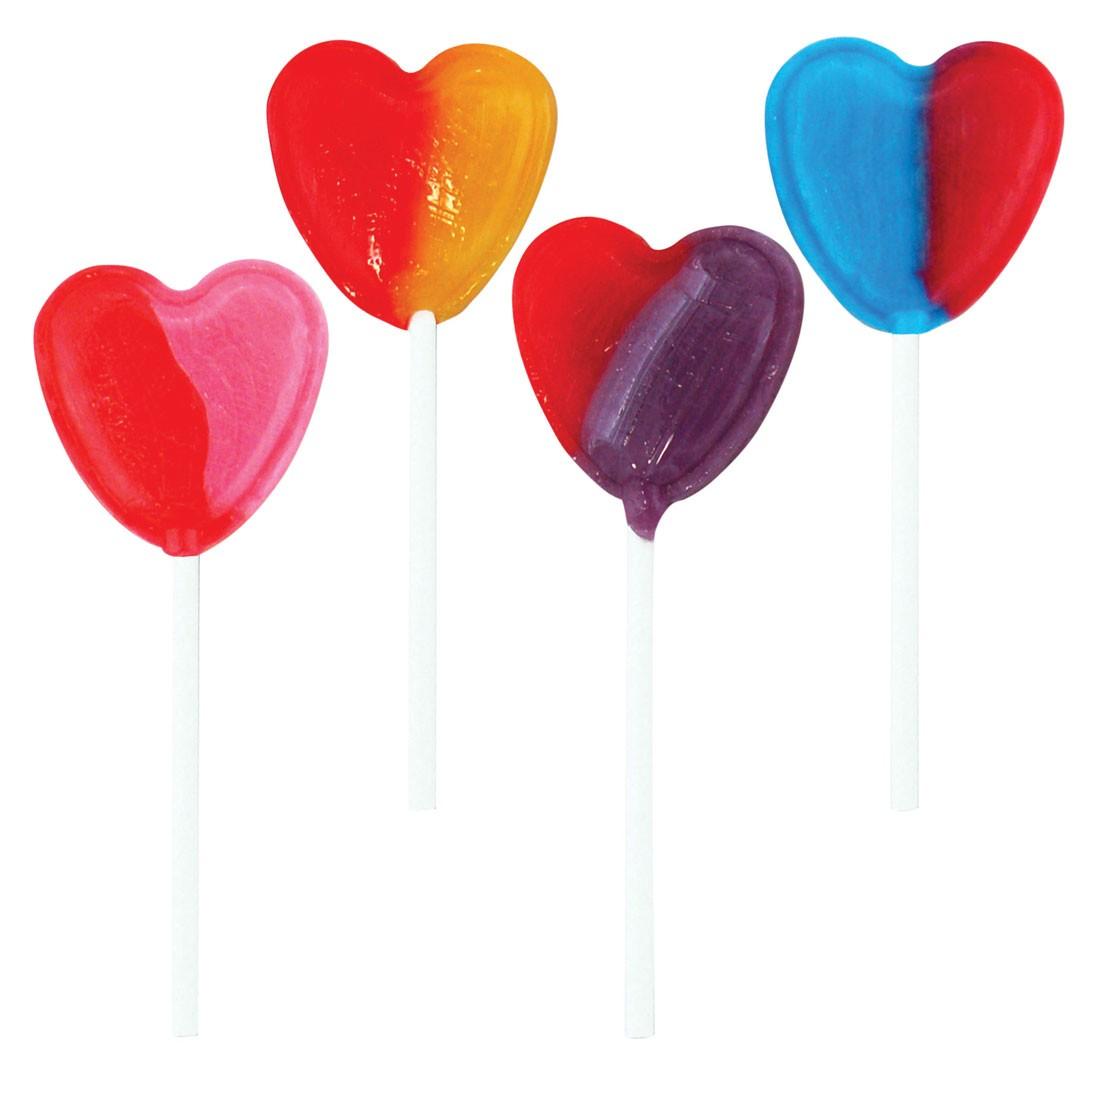 Dum Dums Heart Pops [image]